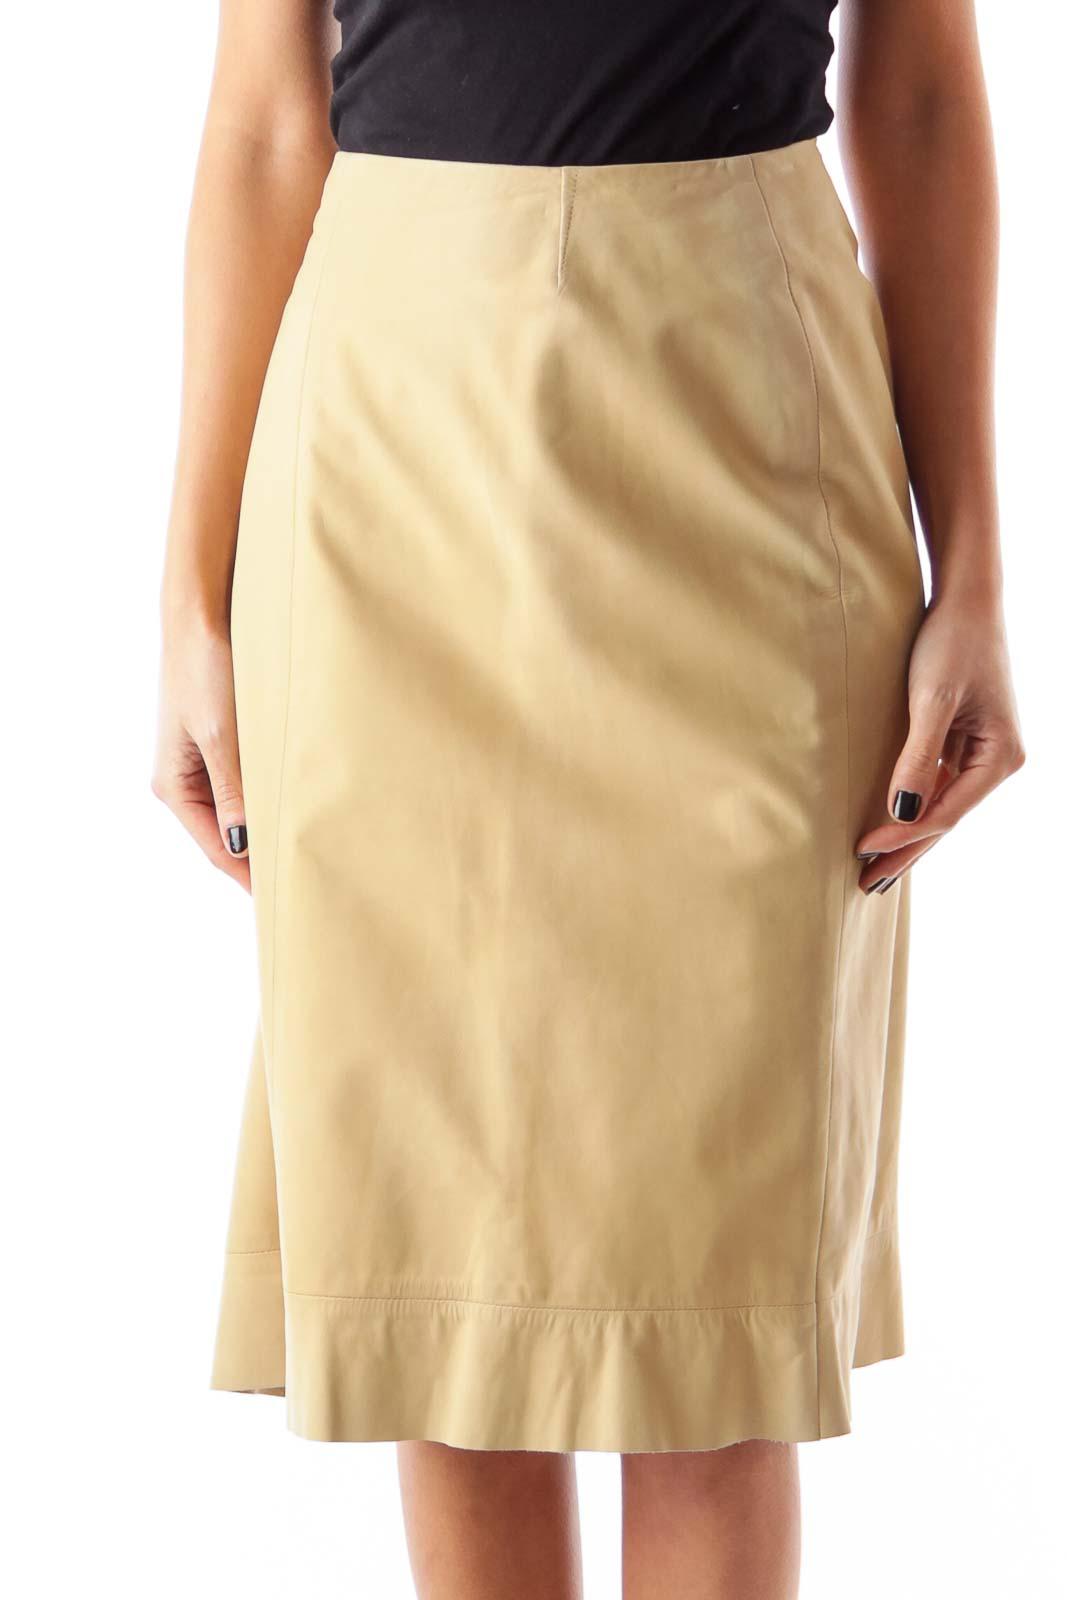 Cream A Line Skirt [14] - SilkRoll